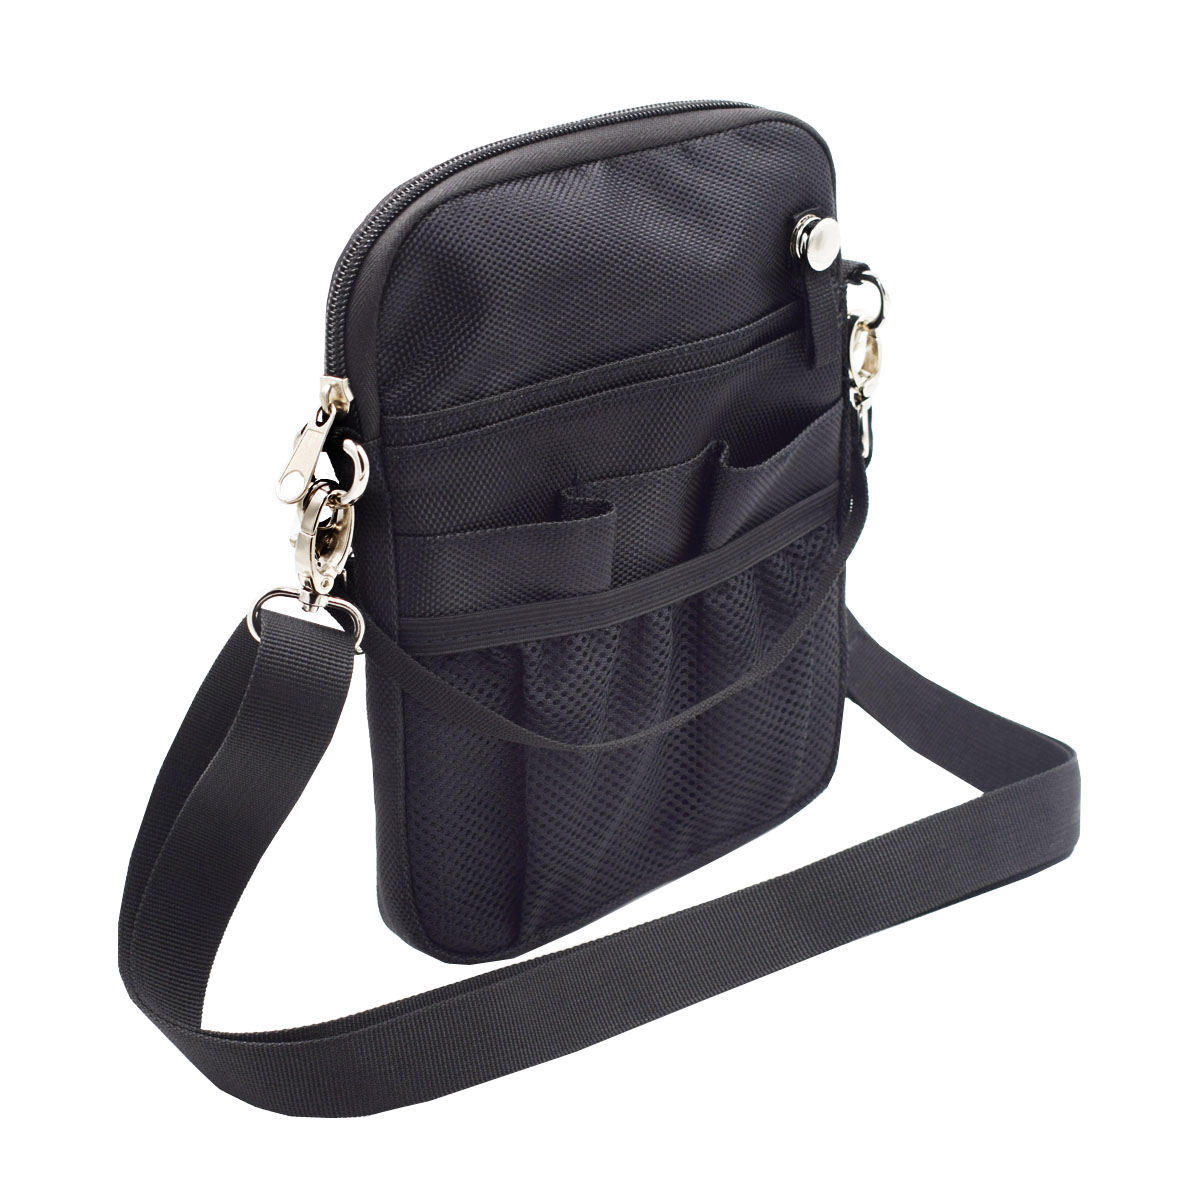 Hospital Nurse Shoulder Bag Care Work Waist Pouch Medical Supplies Crossbody Bags For Women Sac Zipper Storage Fanny Pack Belt